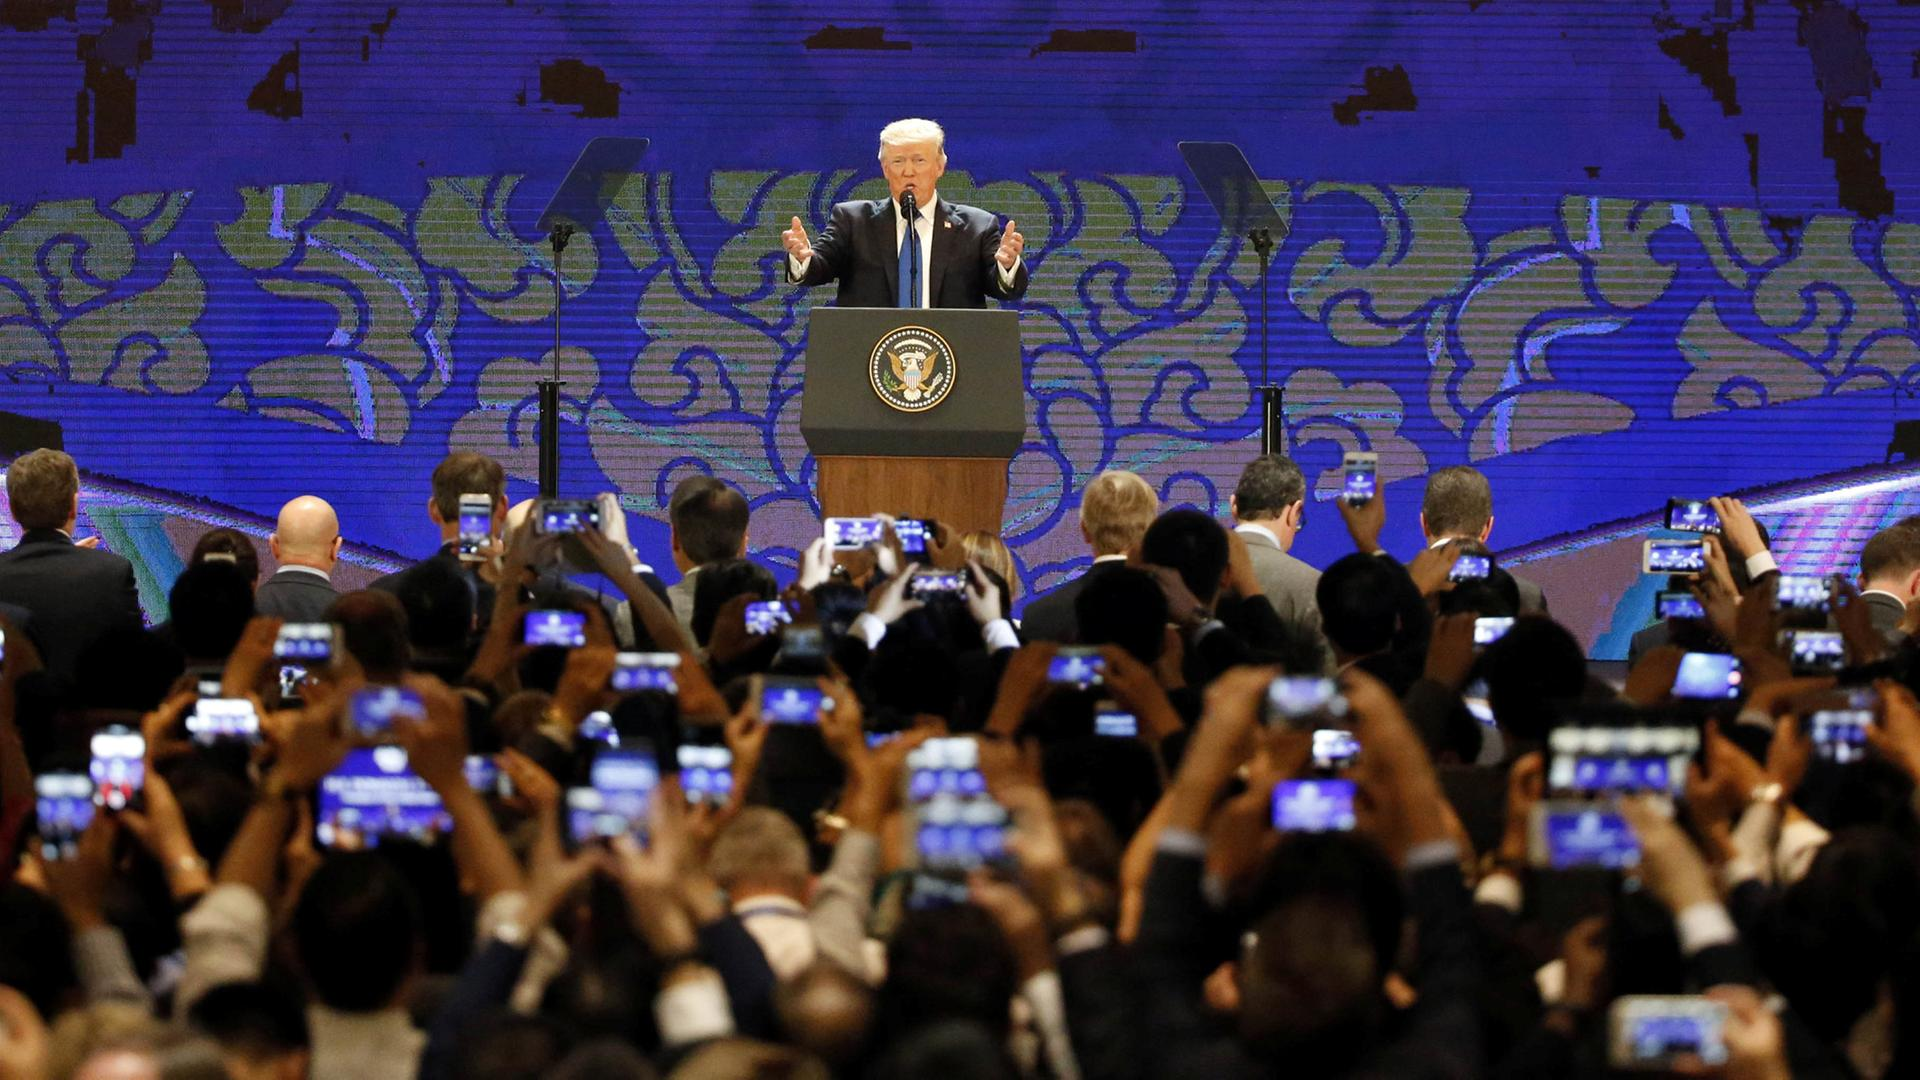 Donald Trump am 10.11.2017 in Da Nang (Vietnam)